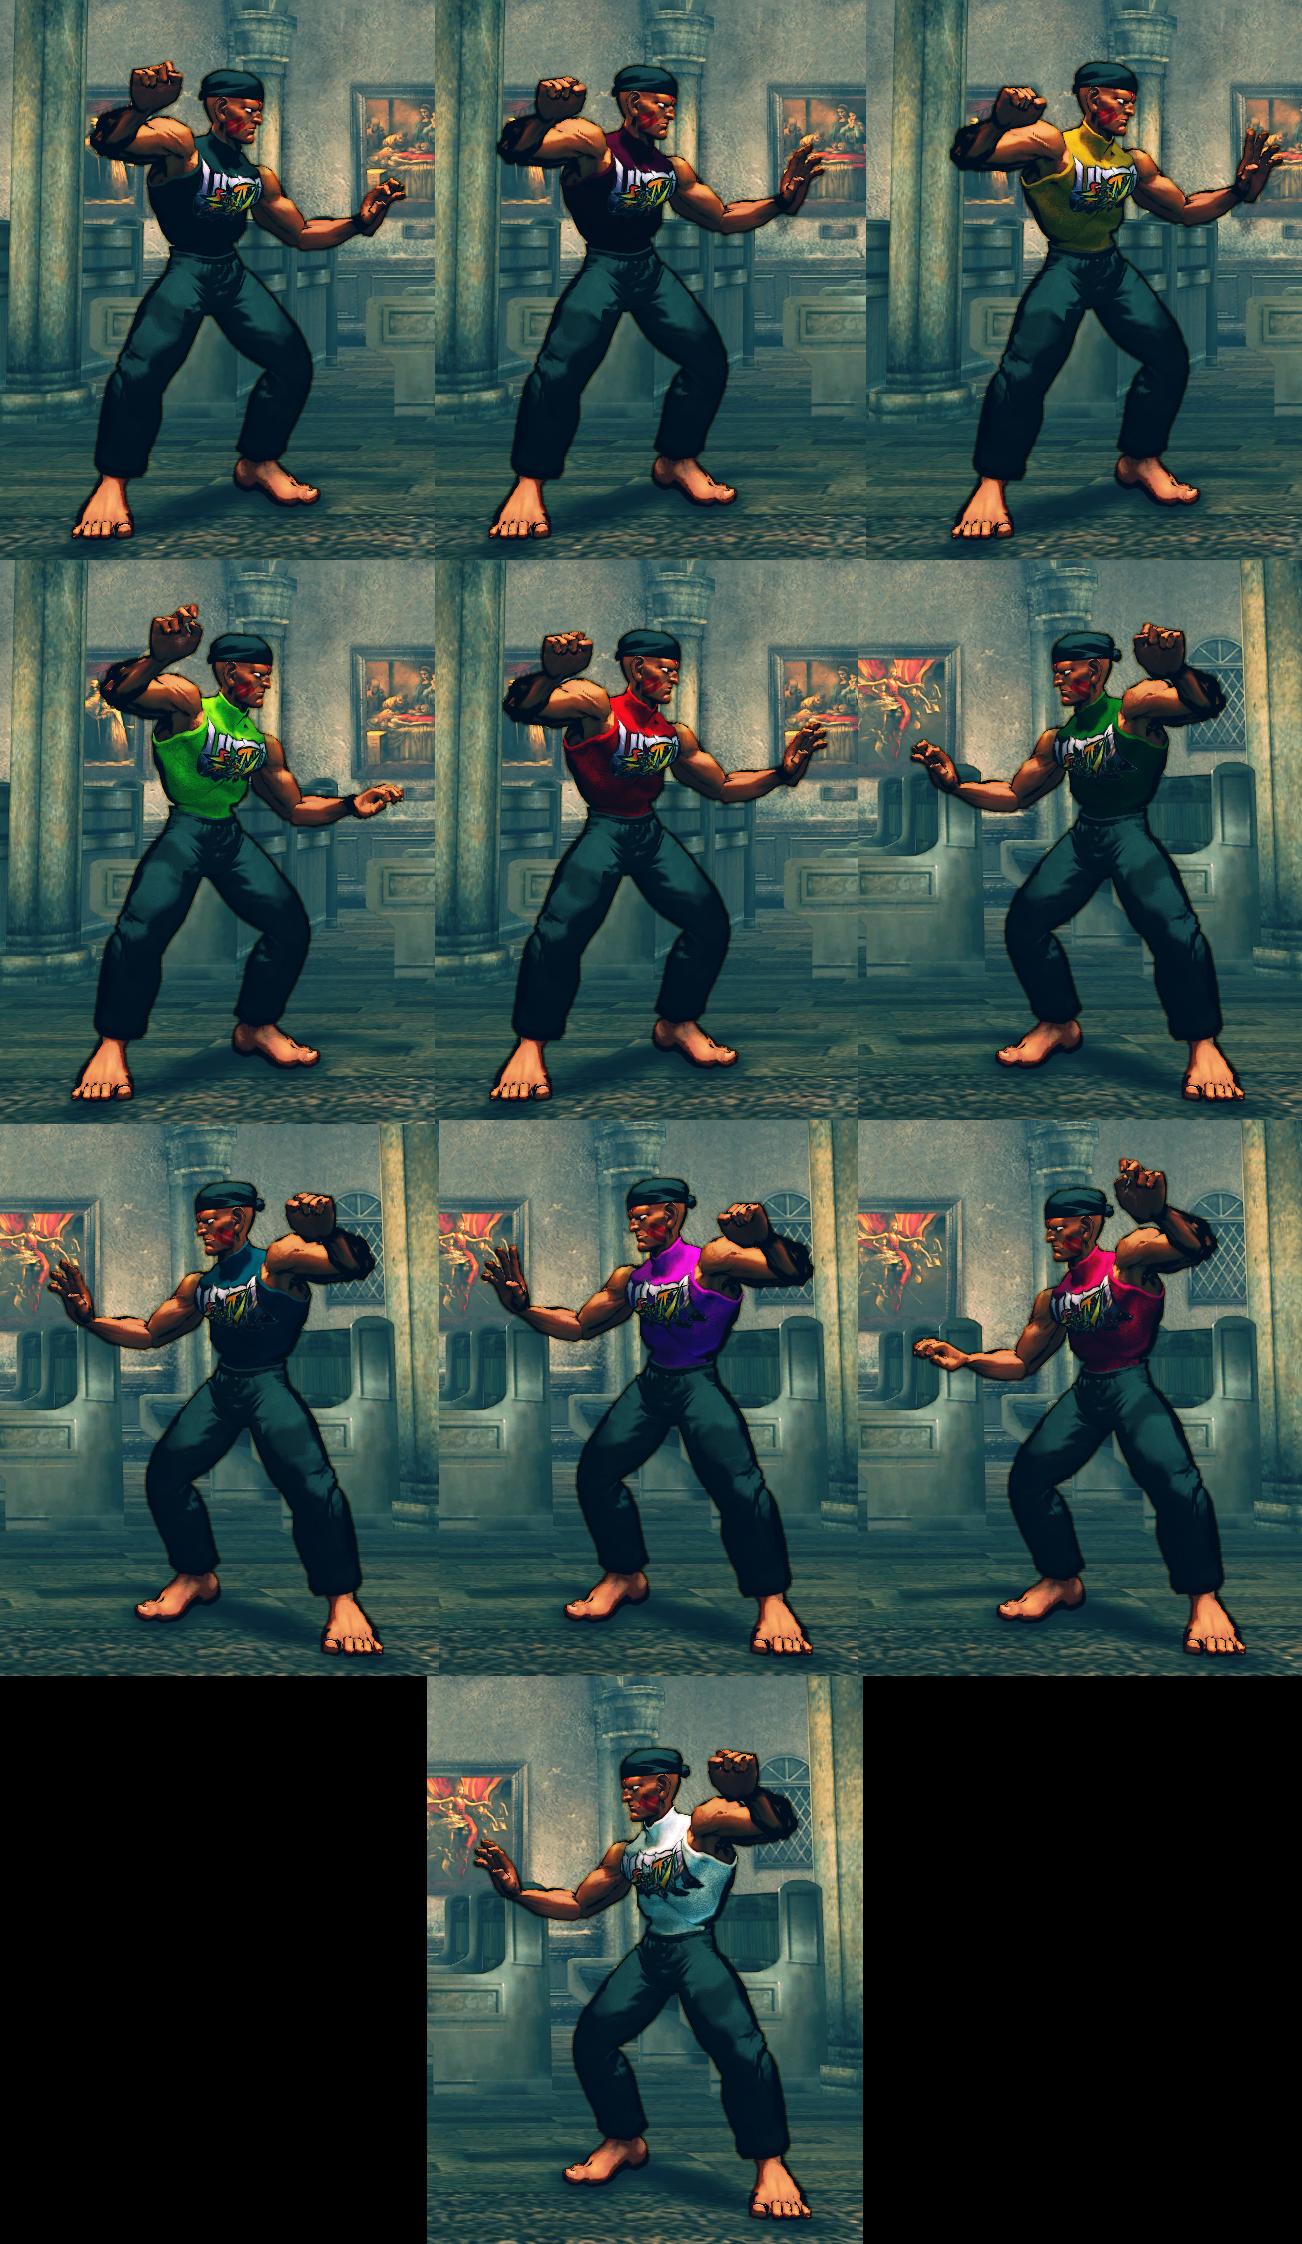 Ultra Street Fighter 4 PC Custom Skin Thread - Page 201